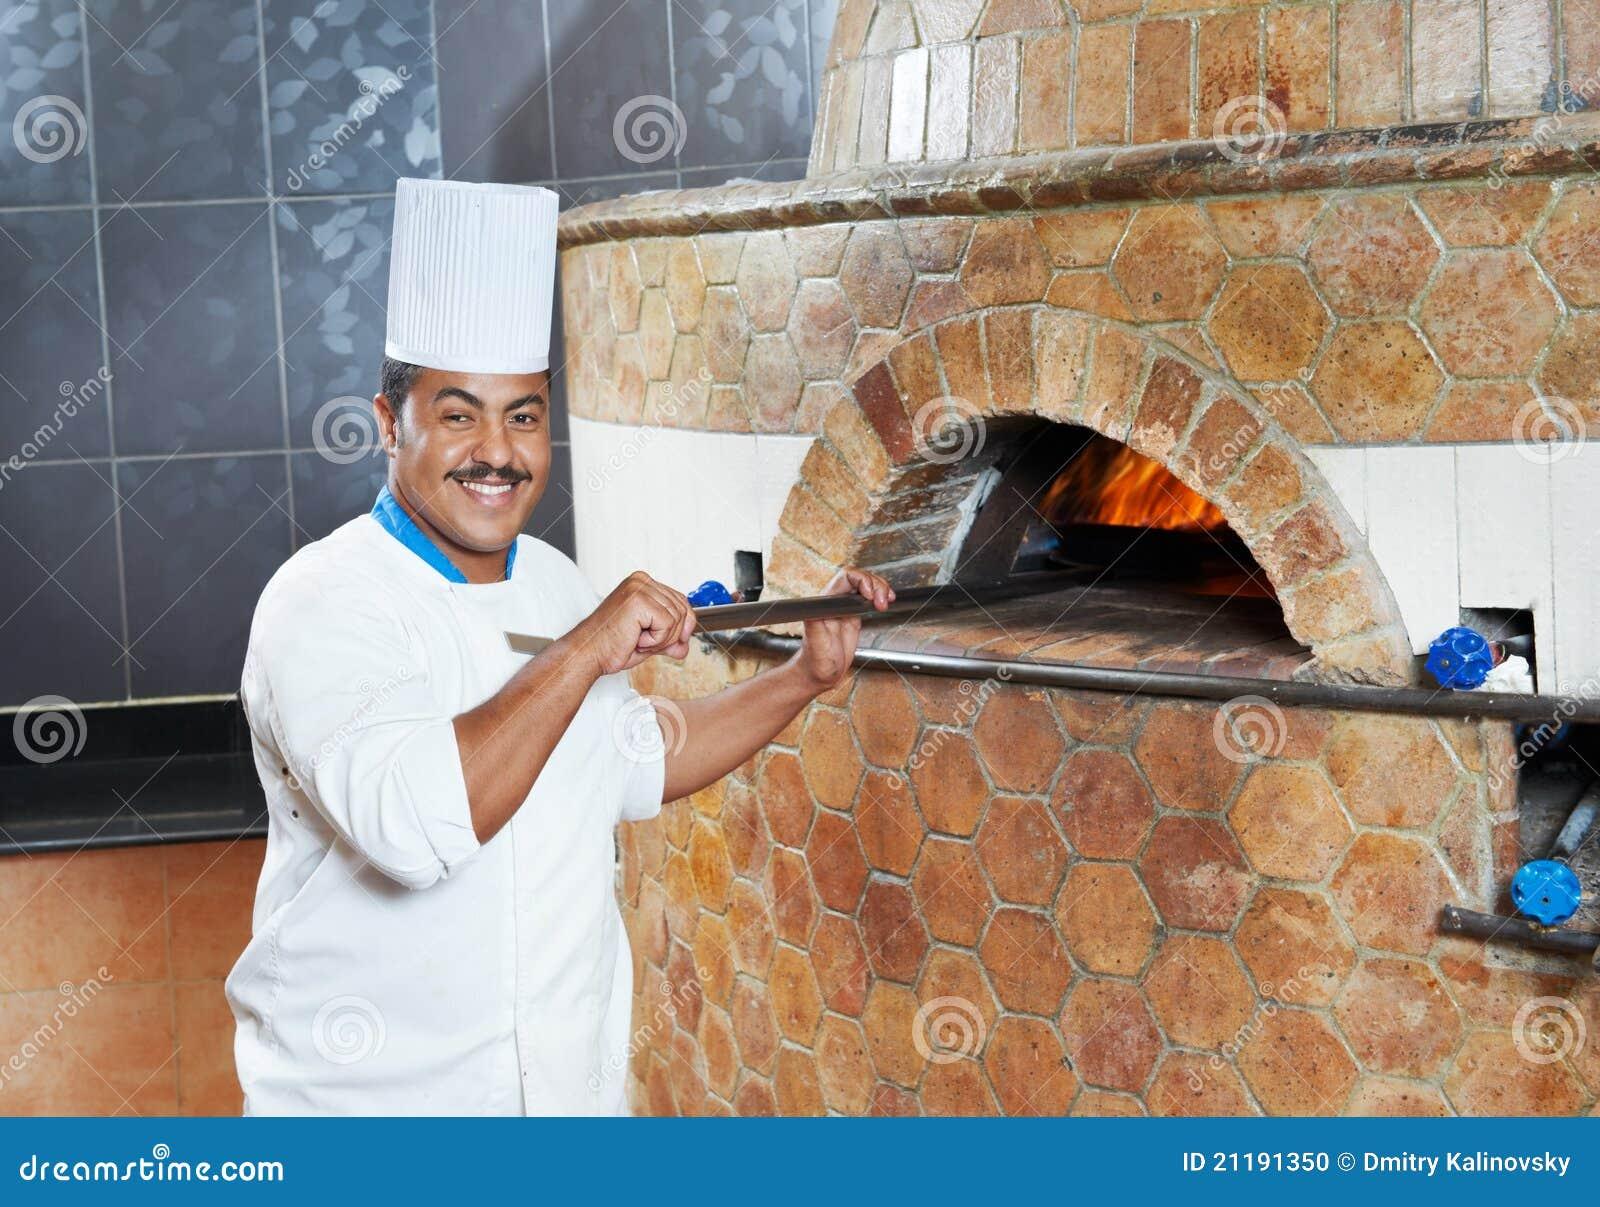 Arab baker chef making Pizza